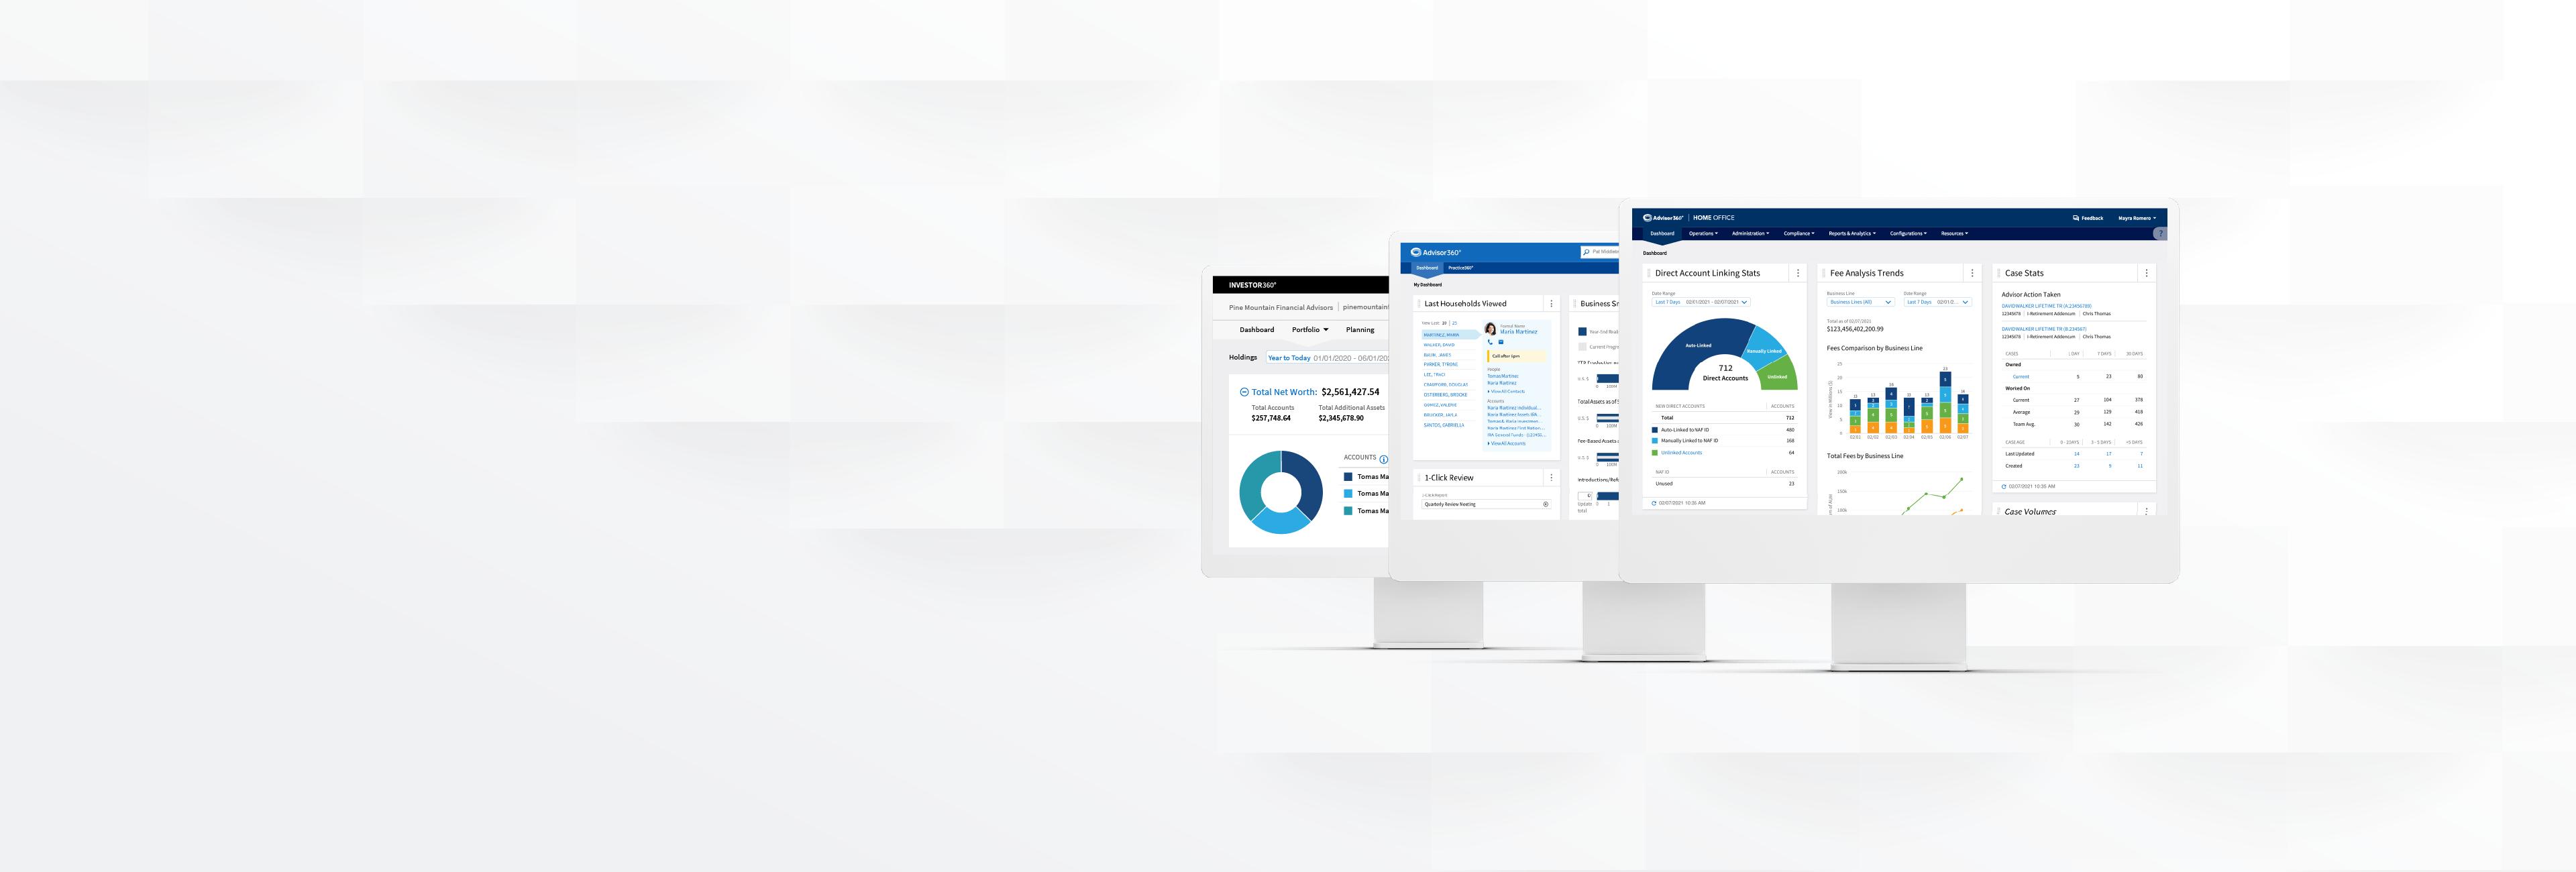 Advisor360 WealthTech Platform Screens